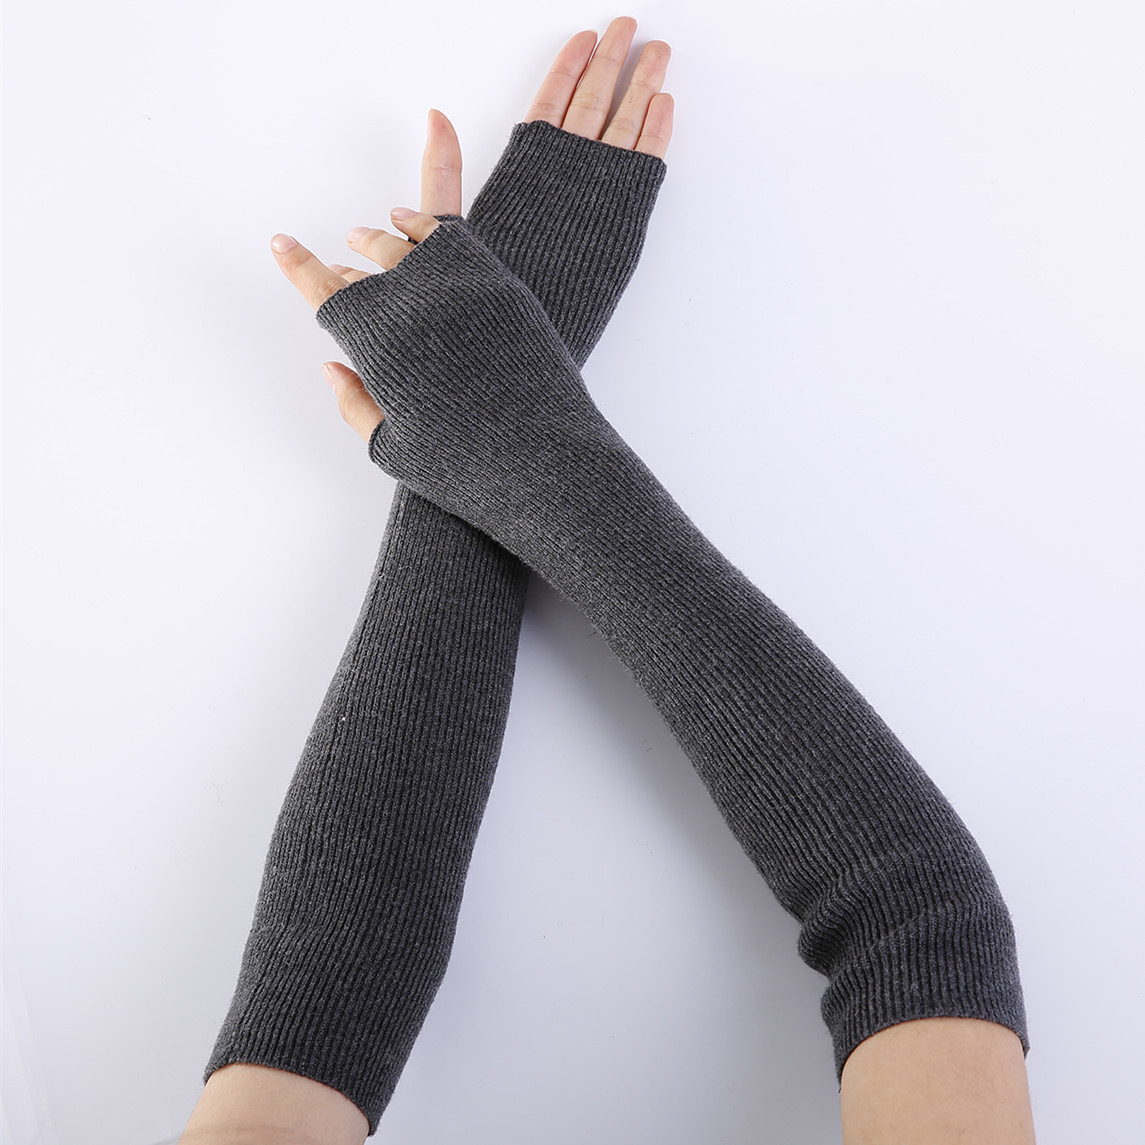 Armstulpen 2018 Winter Reine Farbe Wolle Weiche Modische Warme Handschuhe Finger Kaschmir Halb Arme Arm Wärmer 1 Paar Damen-accessoires